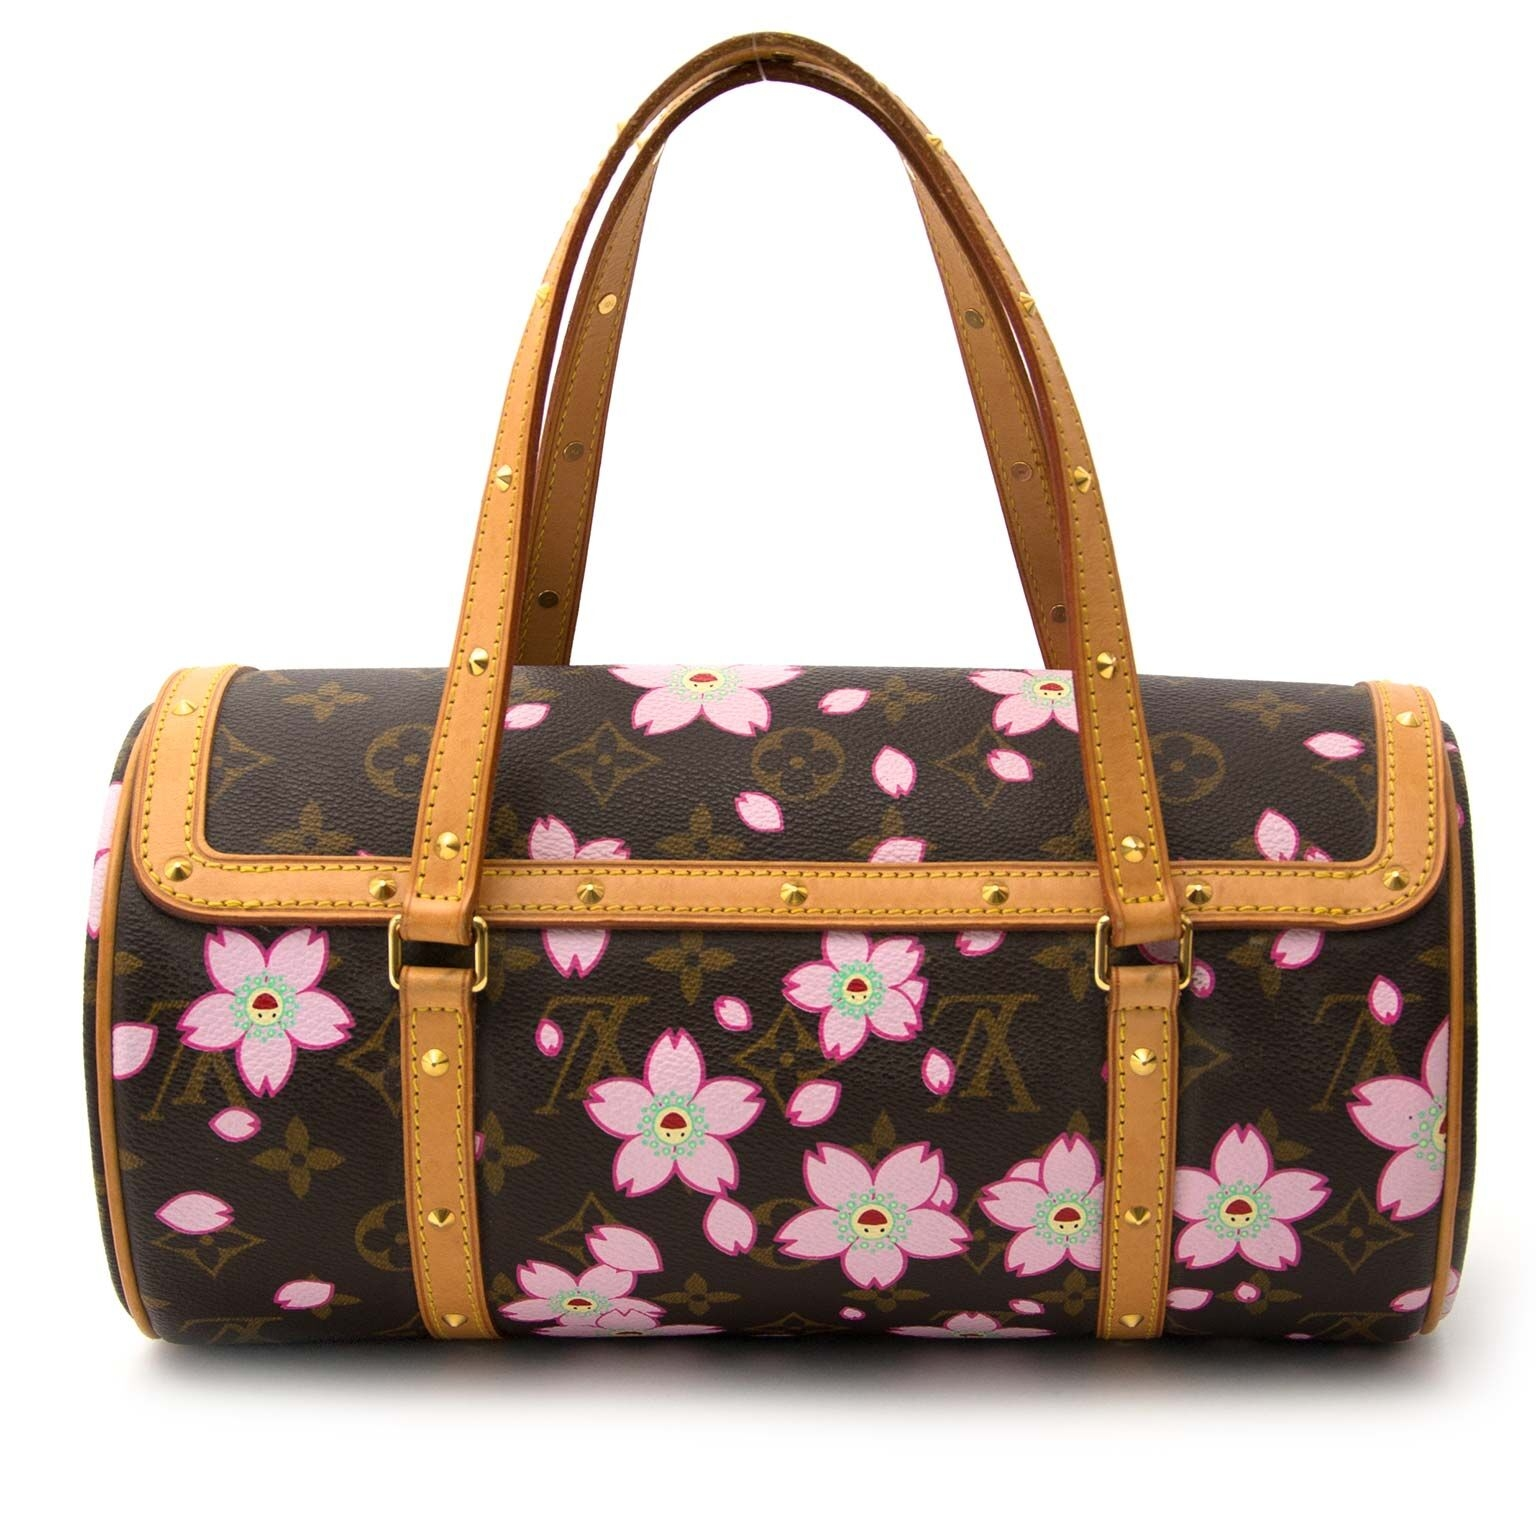 buy Louis Vuitton x Takashi Murakami Papillon Cherry Blossom at labellov